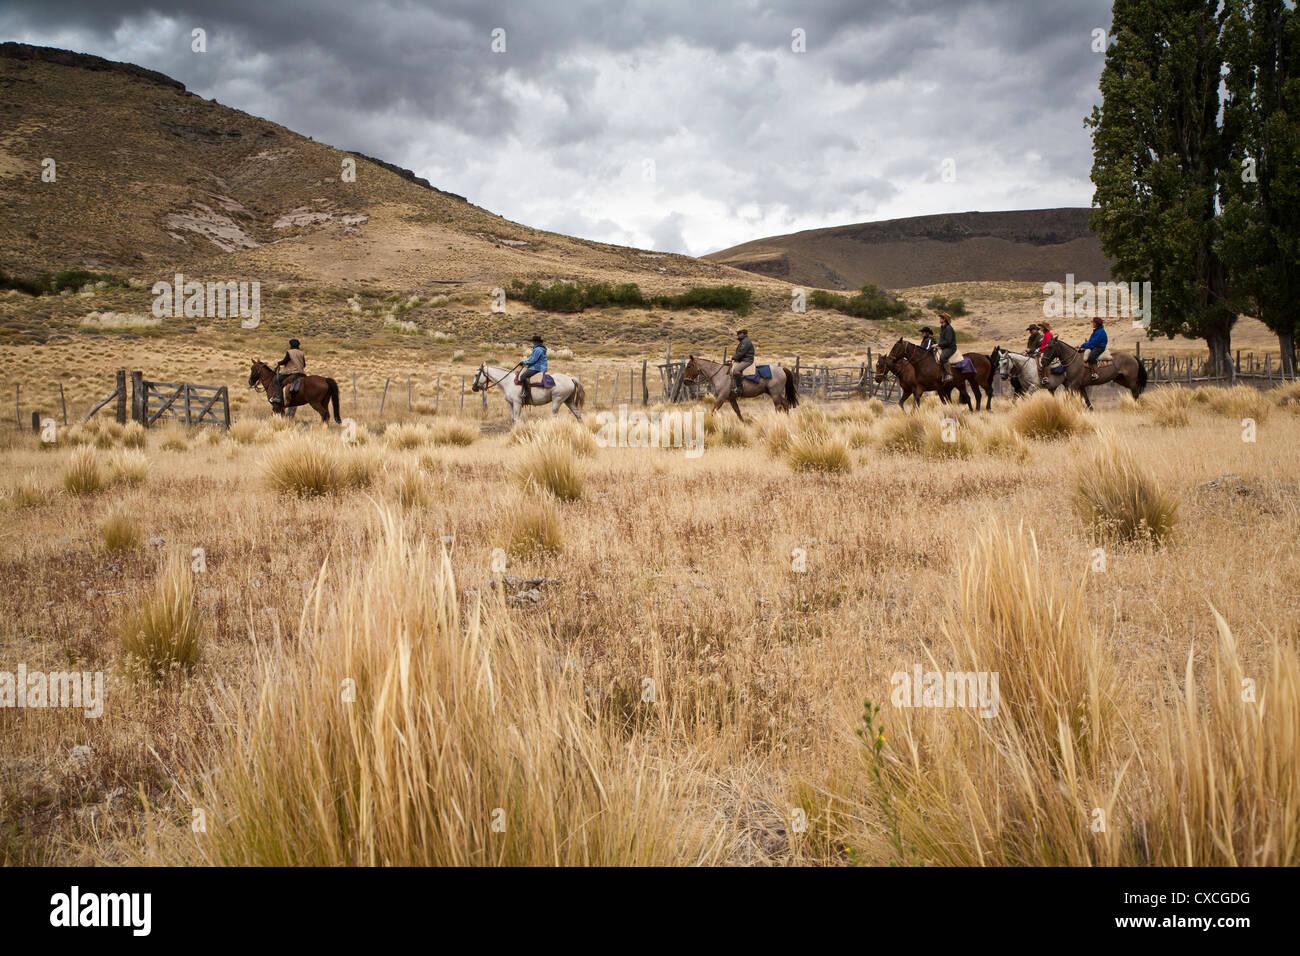 L'équitation, Patagonie, Argentine. Photo Stock